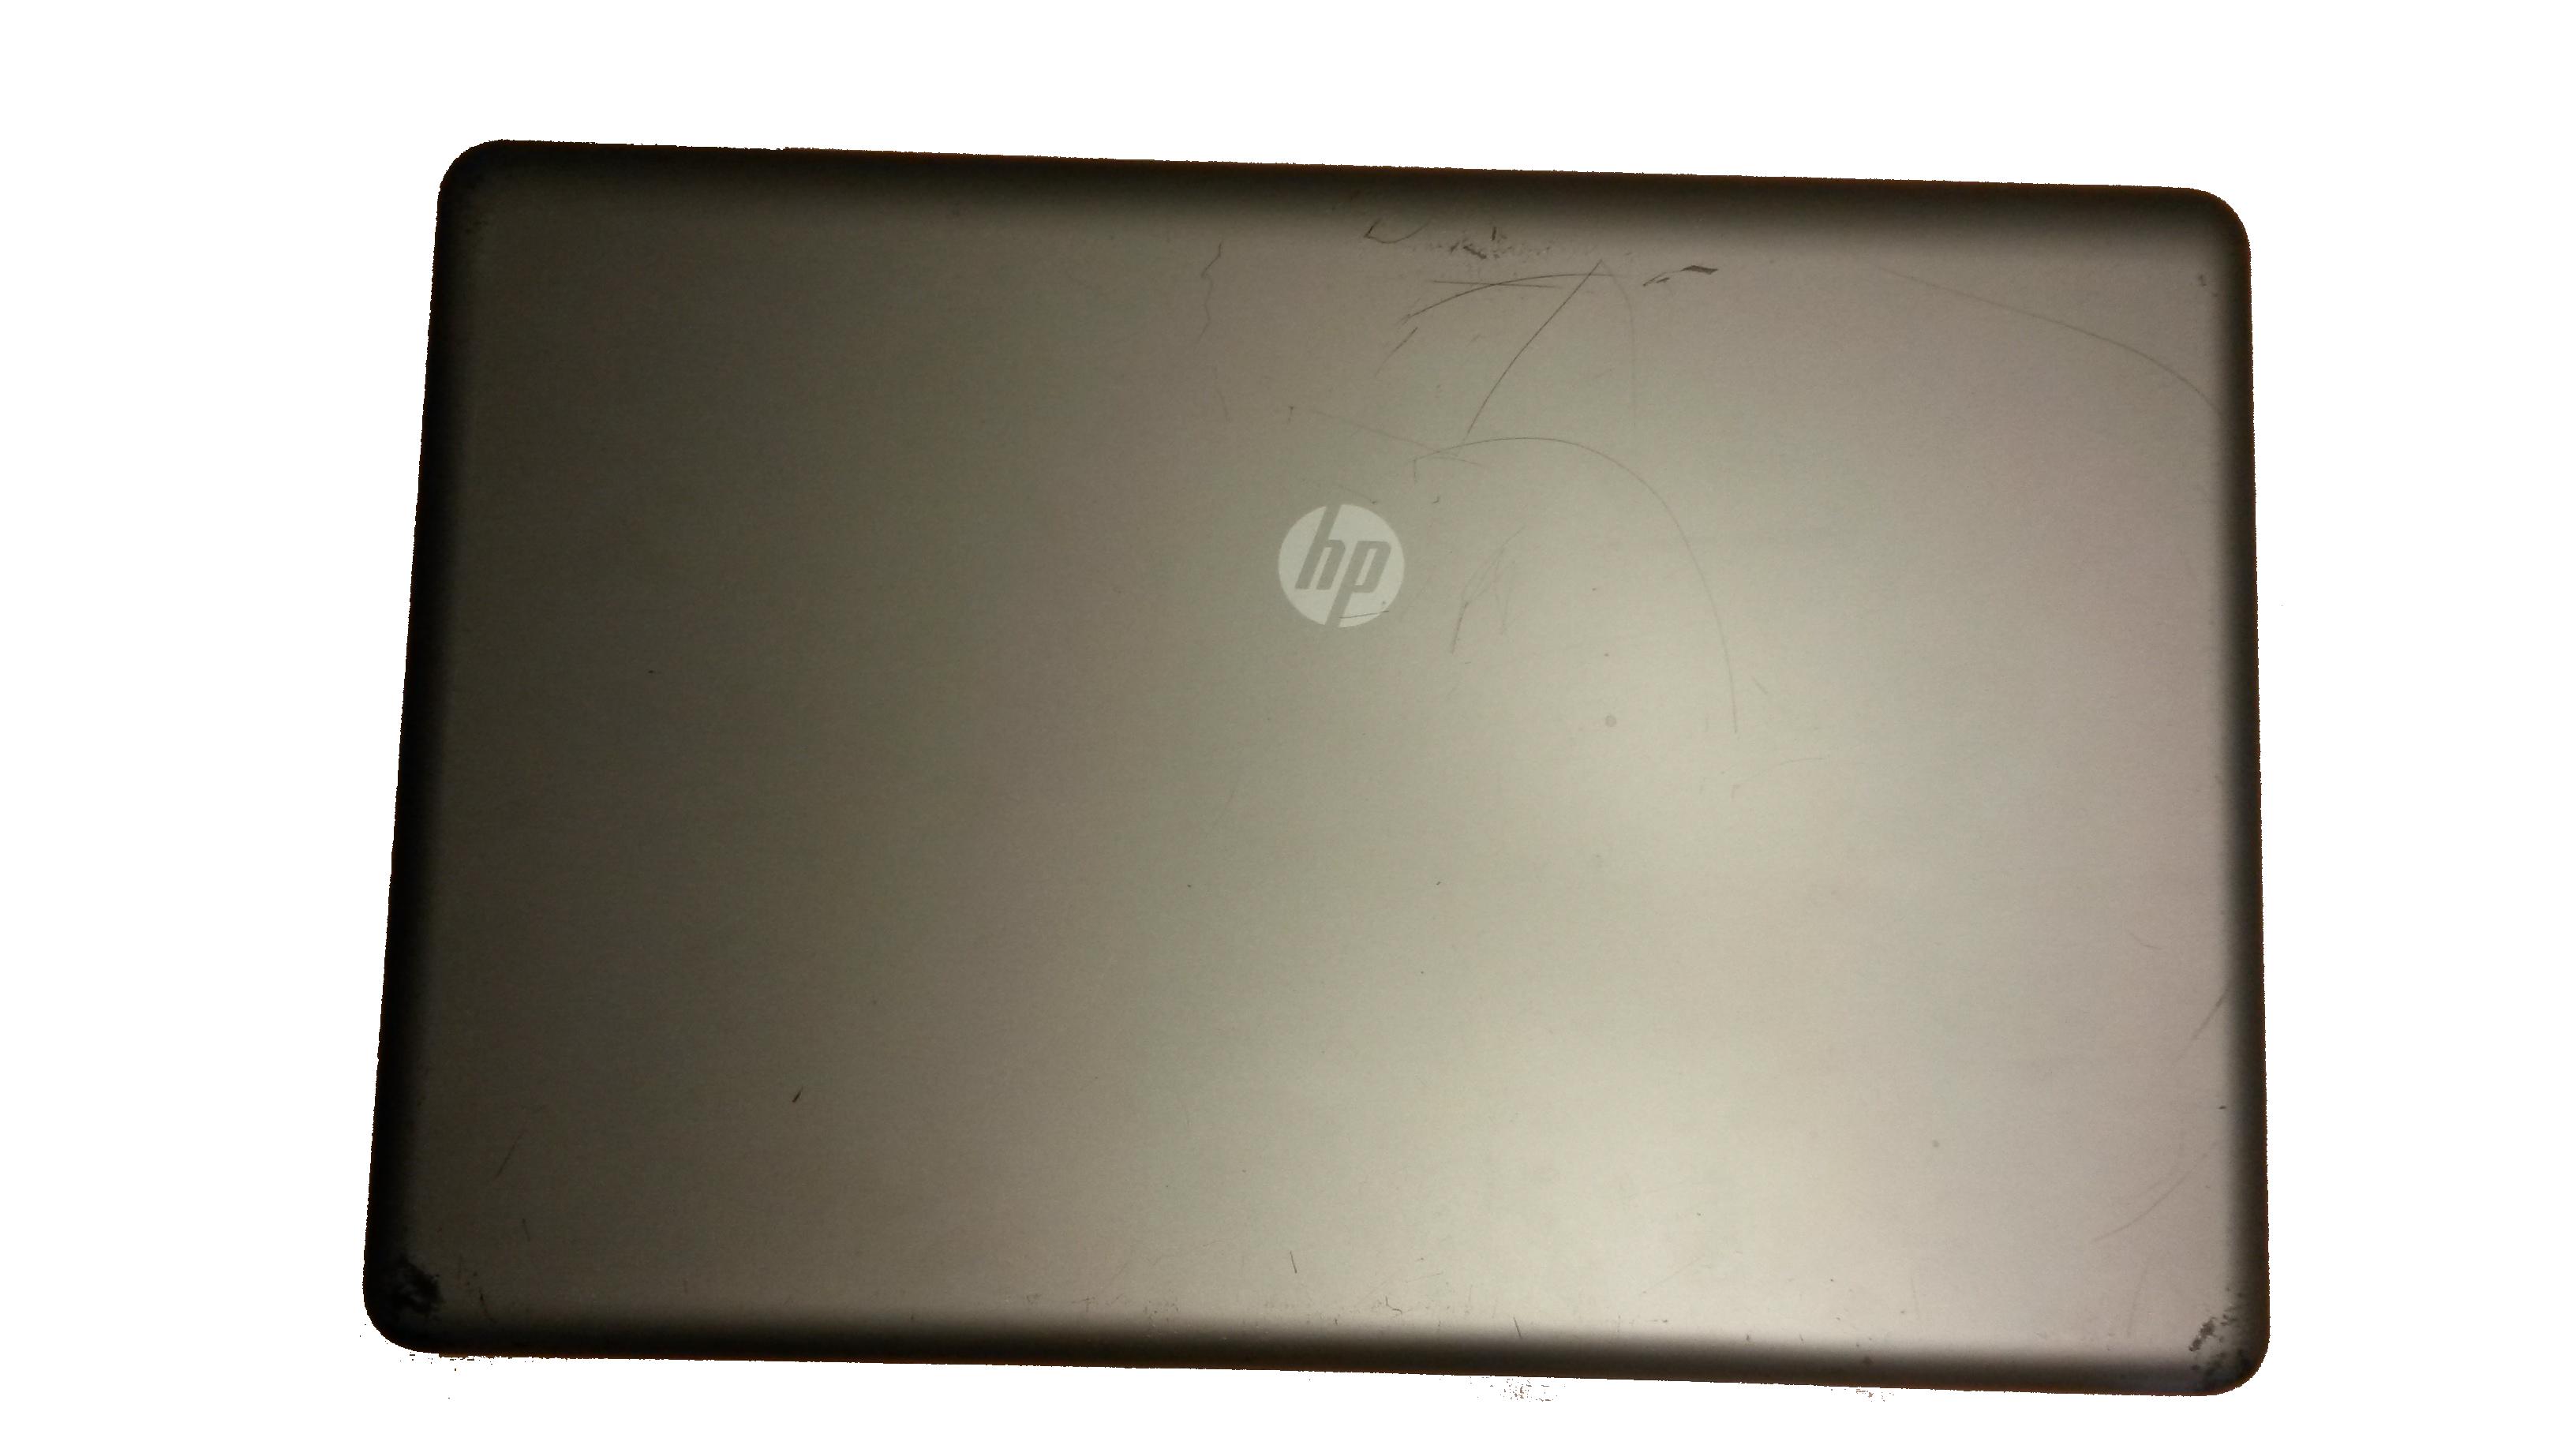 HP 630 LCD hátlap wifi antennával 7627c37daf